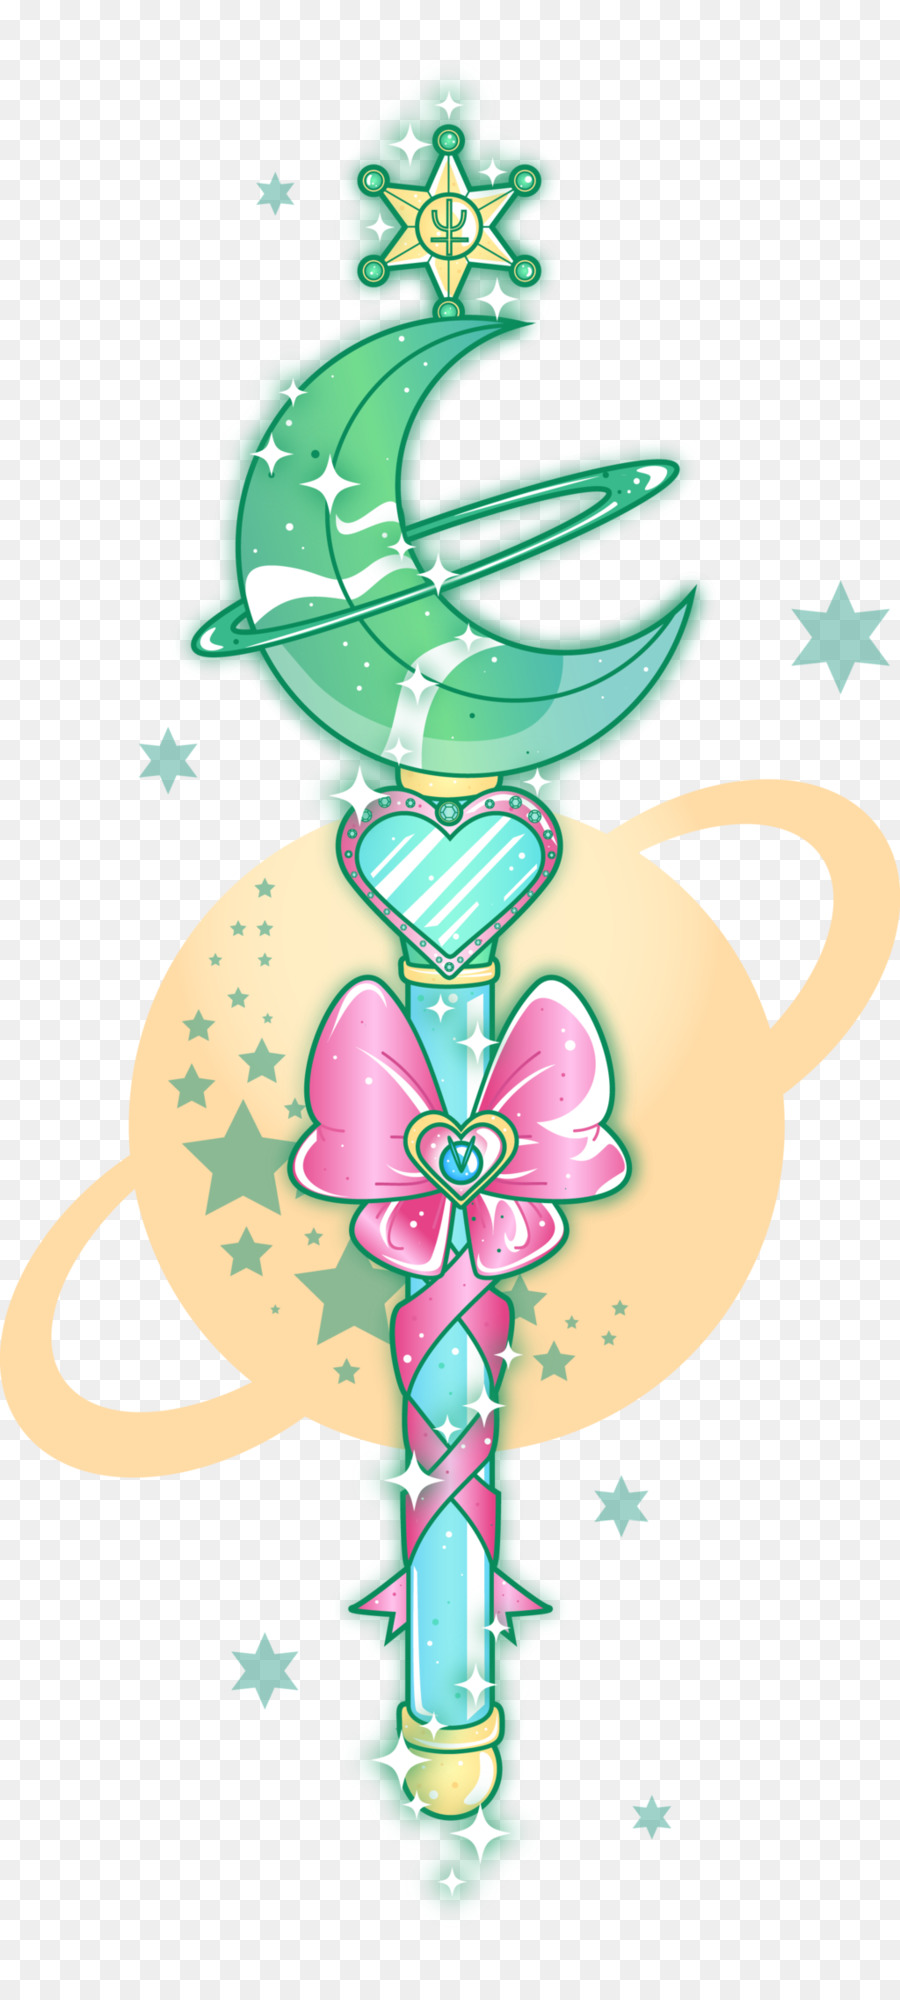 Descarga gratuita de Sailor Neptune, Sailor Moon, Sailor Urano imágenes PNG